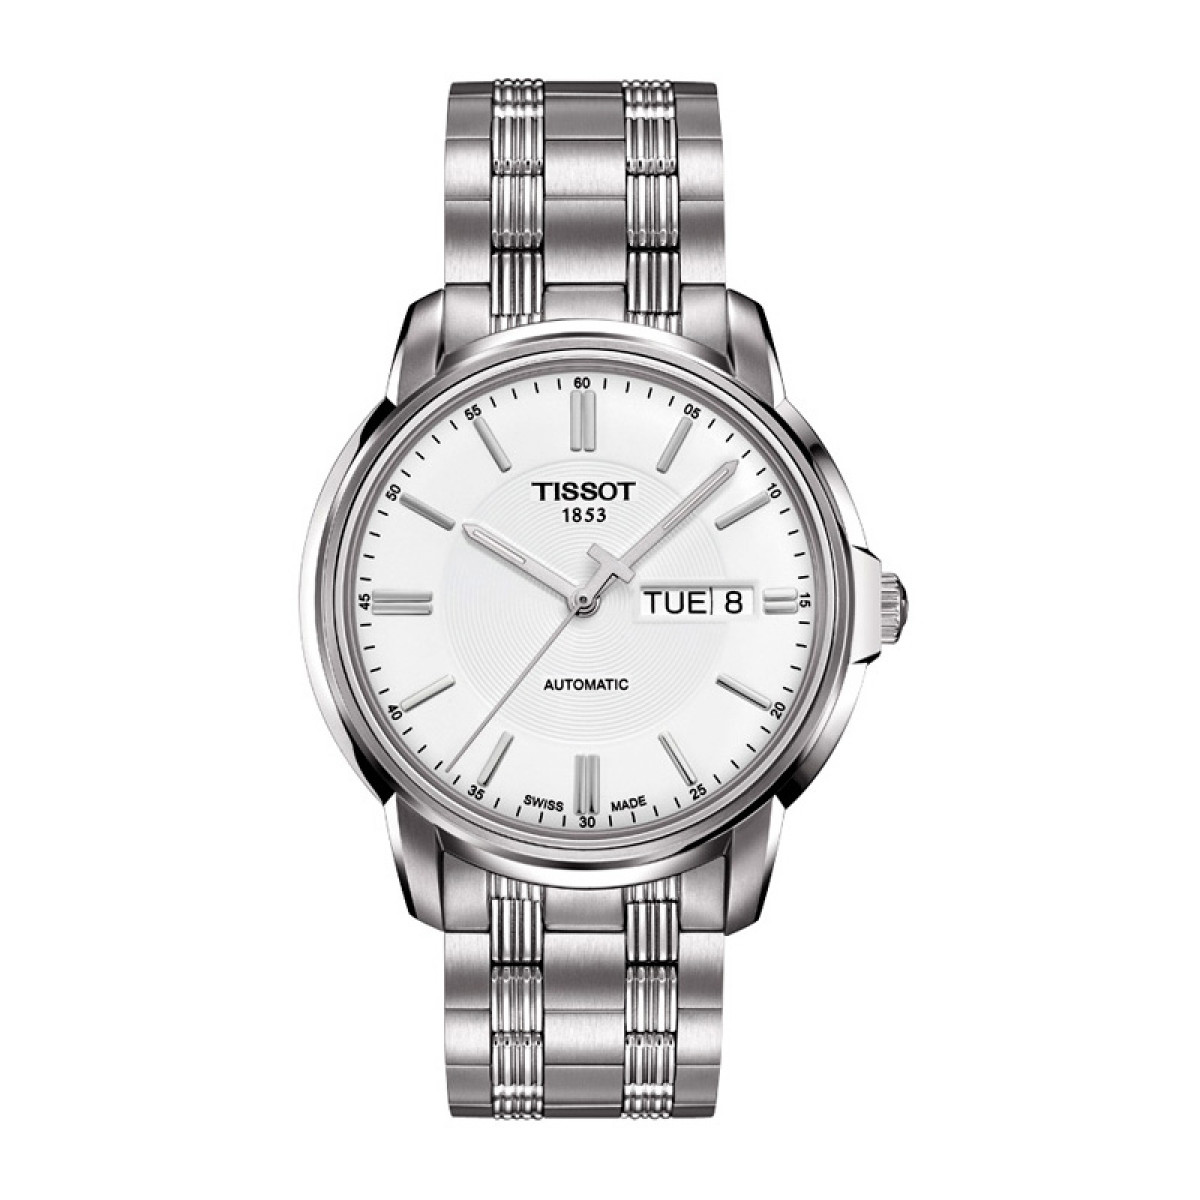 Часовник Tissot T065.430.11.031.00